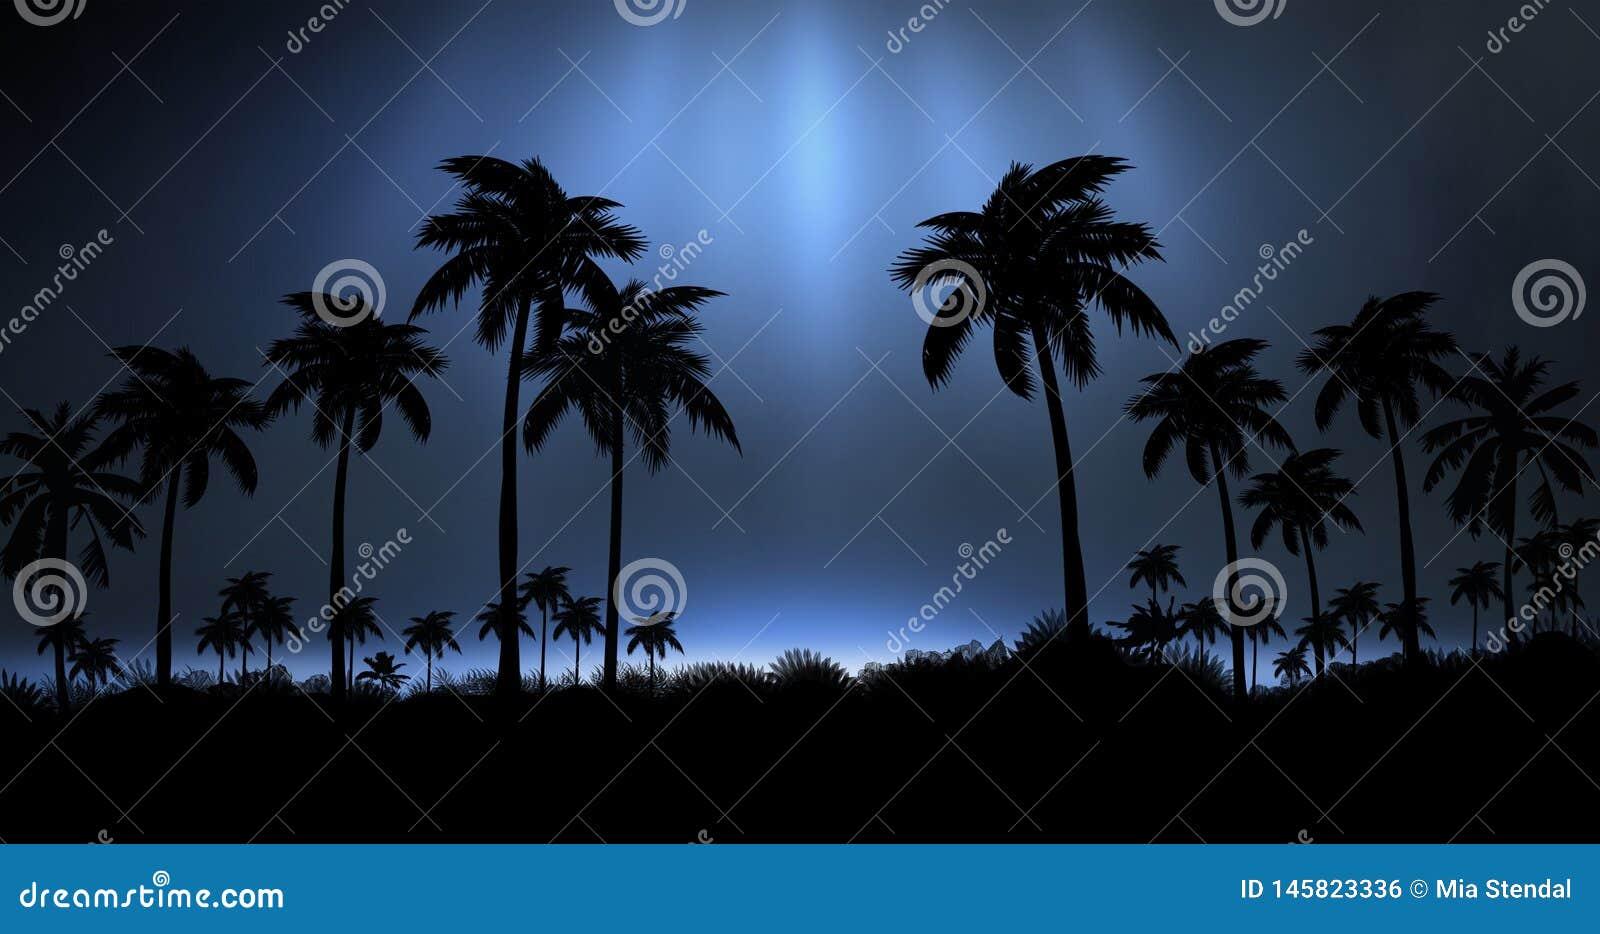 Ландшафт ночи с пальмами, против фона неонового захода солнца, звезды Пальмы кокоса силуэта на пляже на заходе солнца